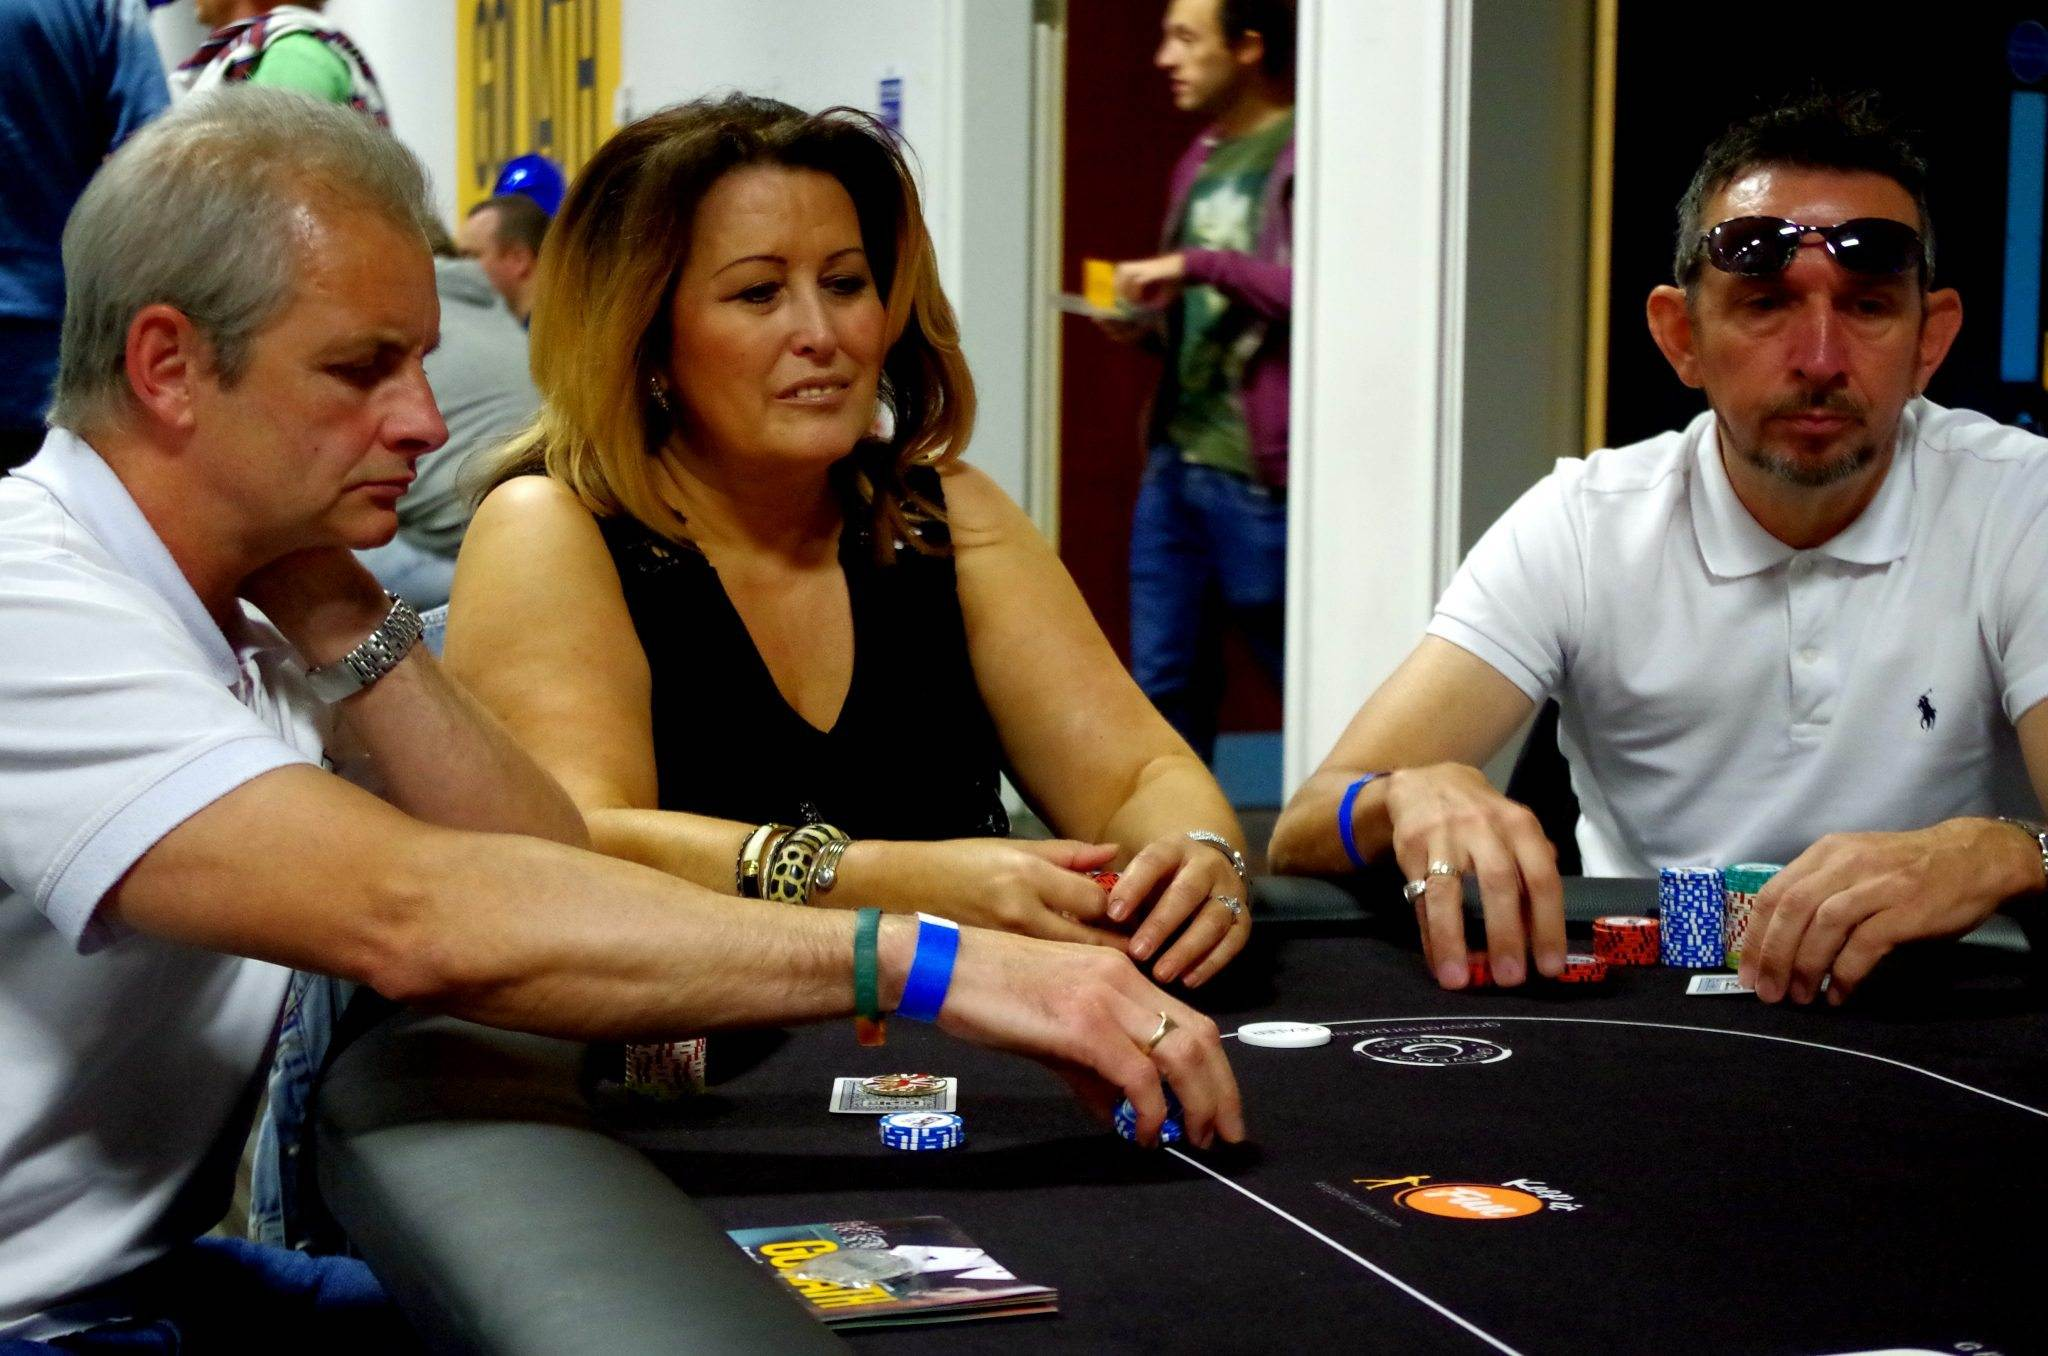 Casey quinlan poker academics review genetic roulette